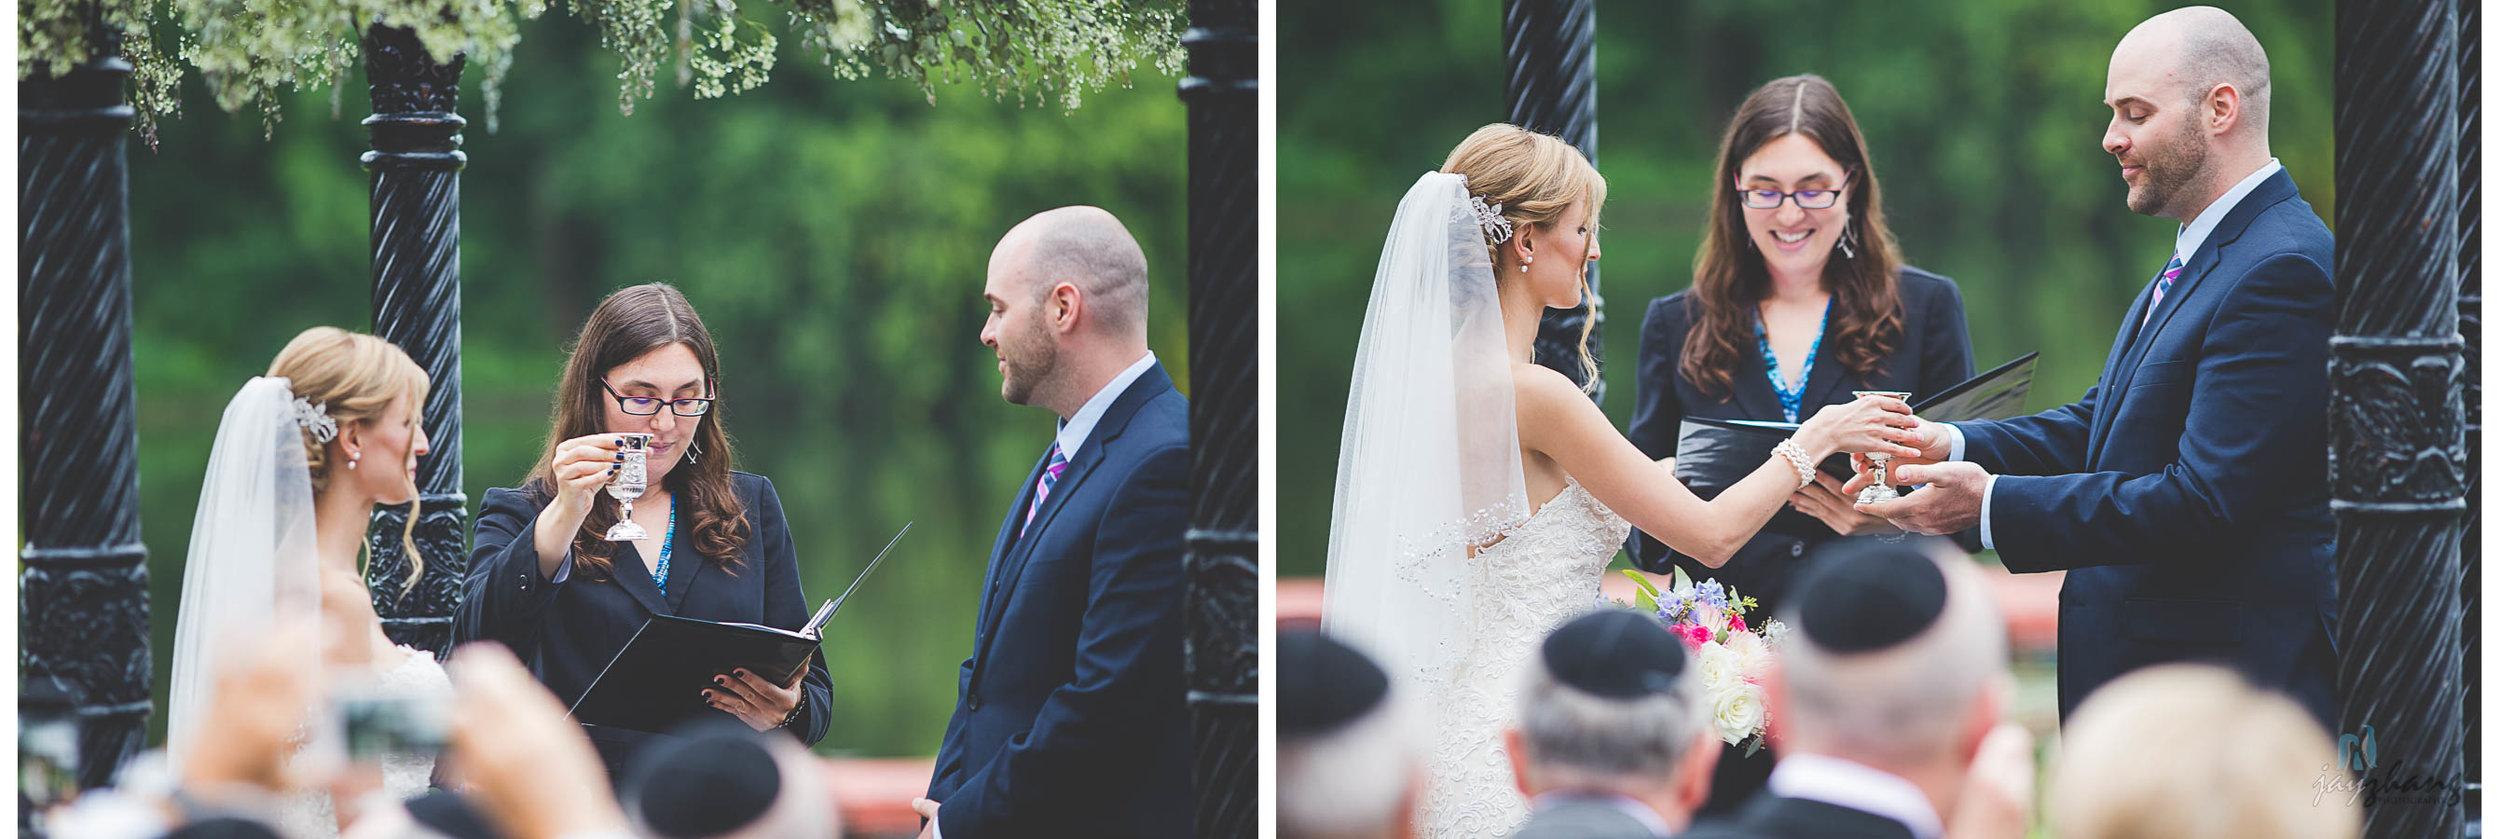 Albany_Wedding_Photographer-29.jpg